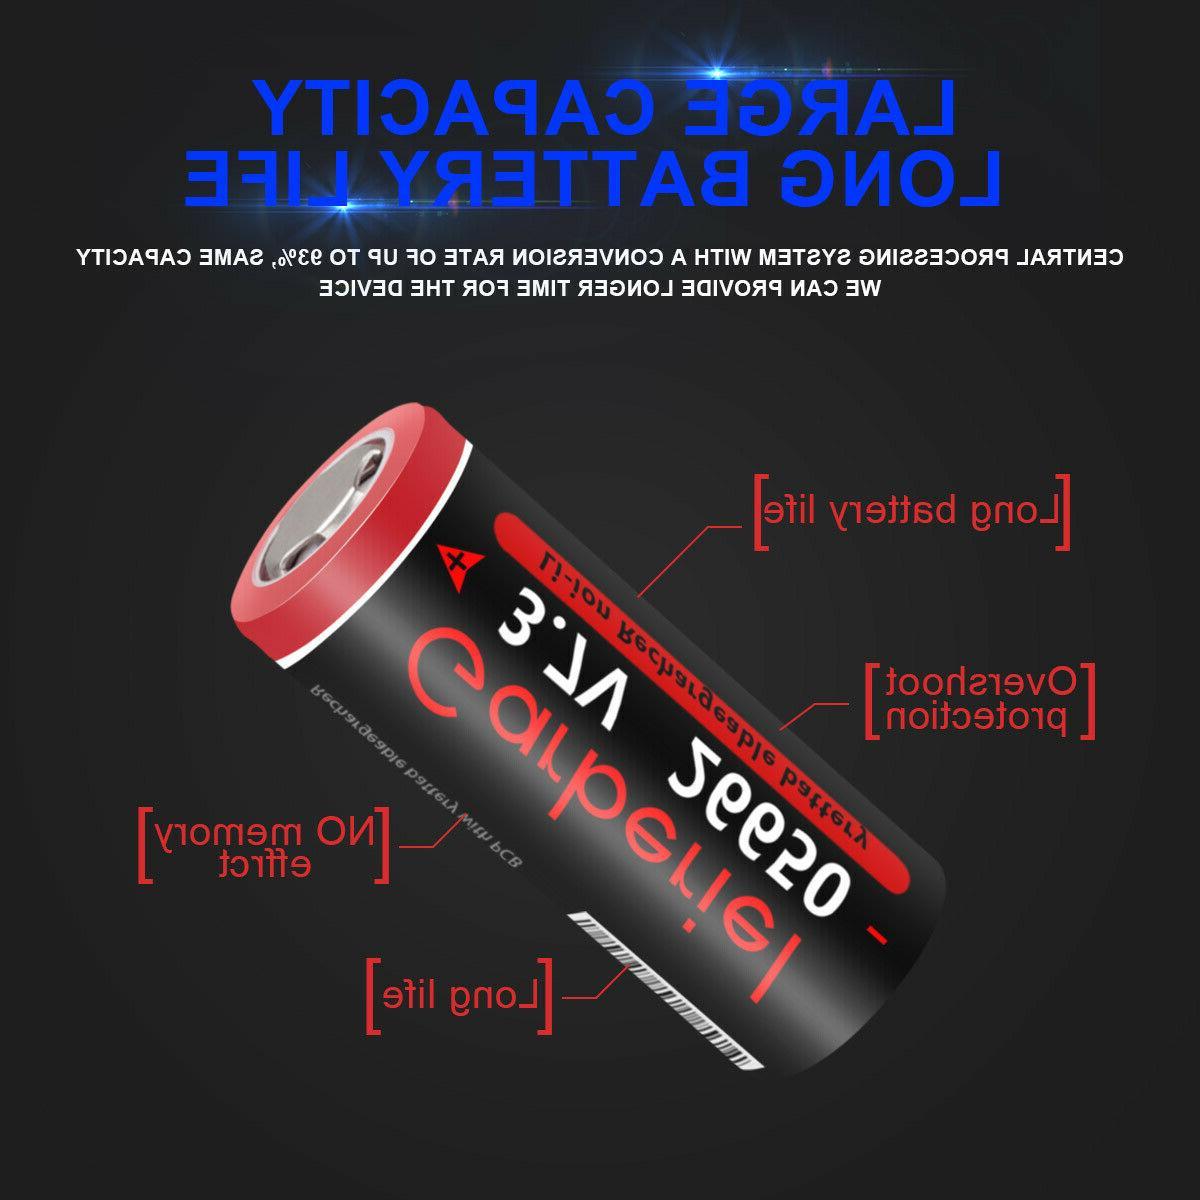 26650 3.7V for Flashlight